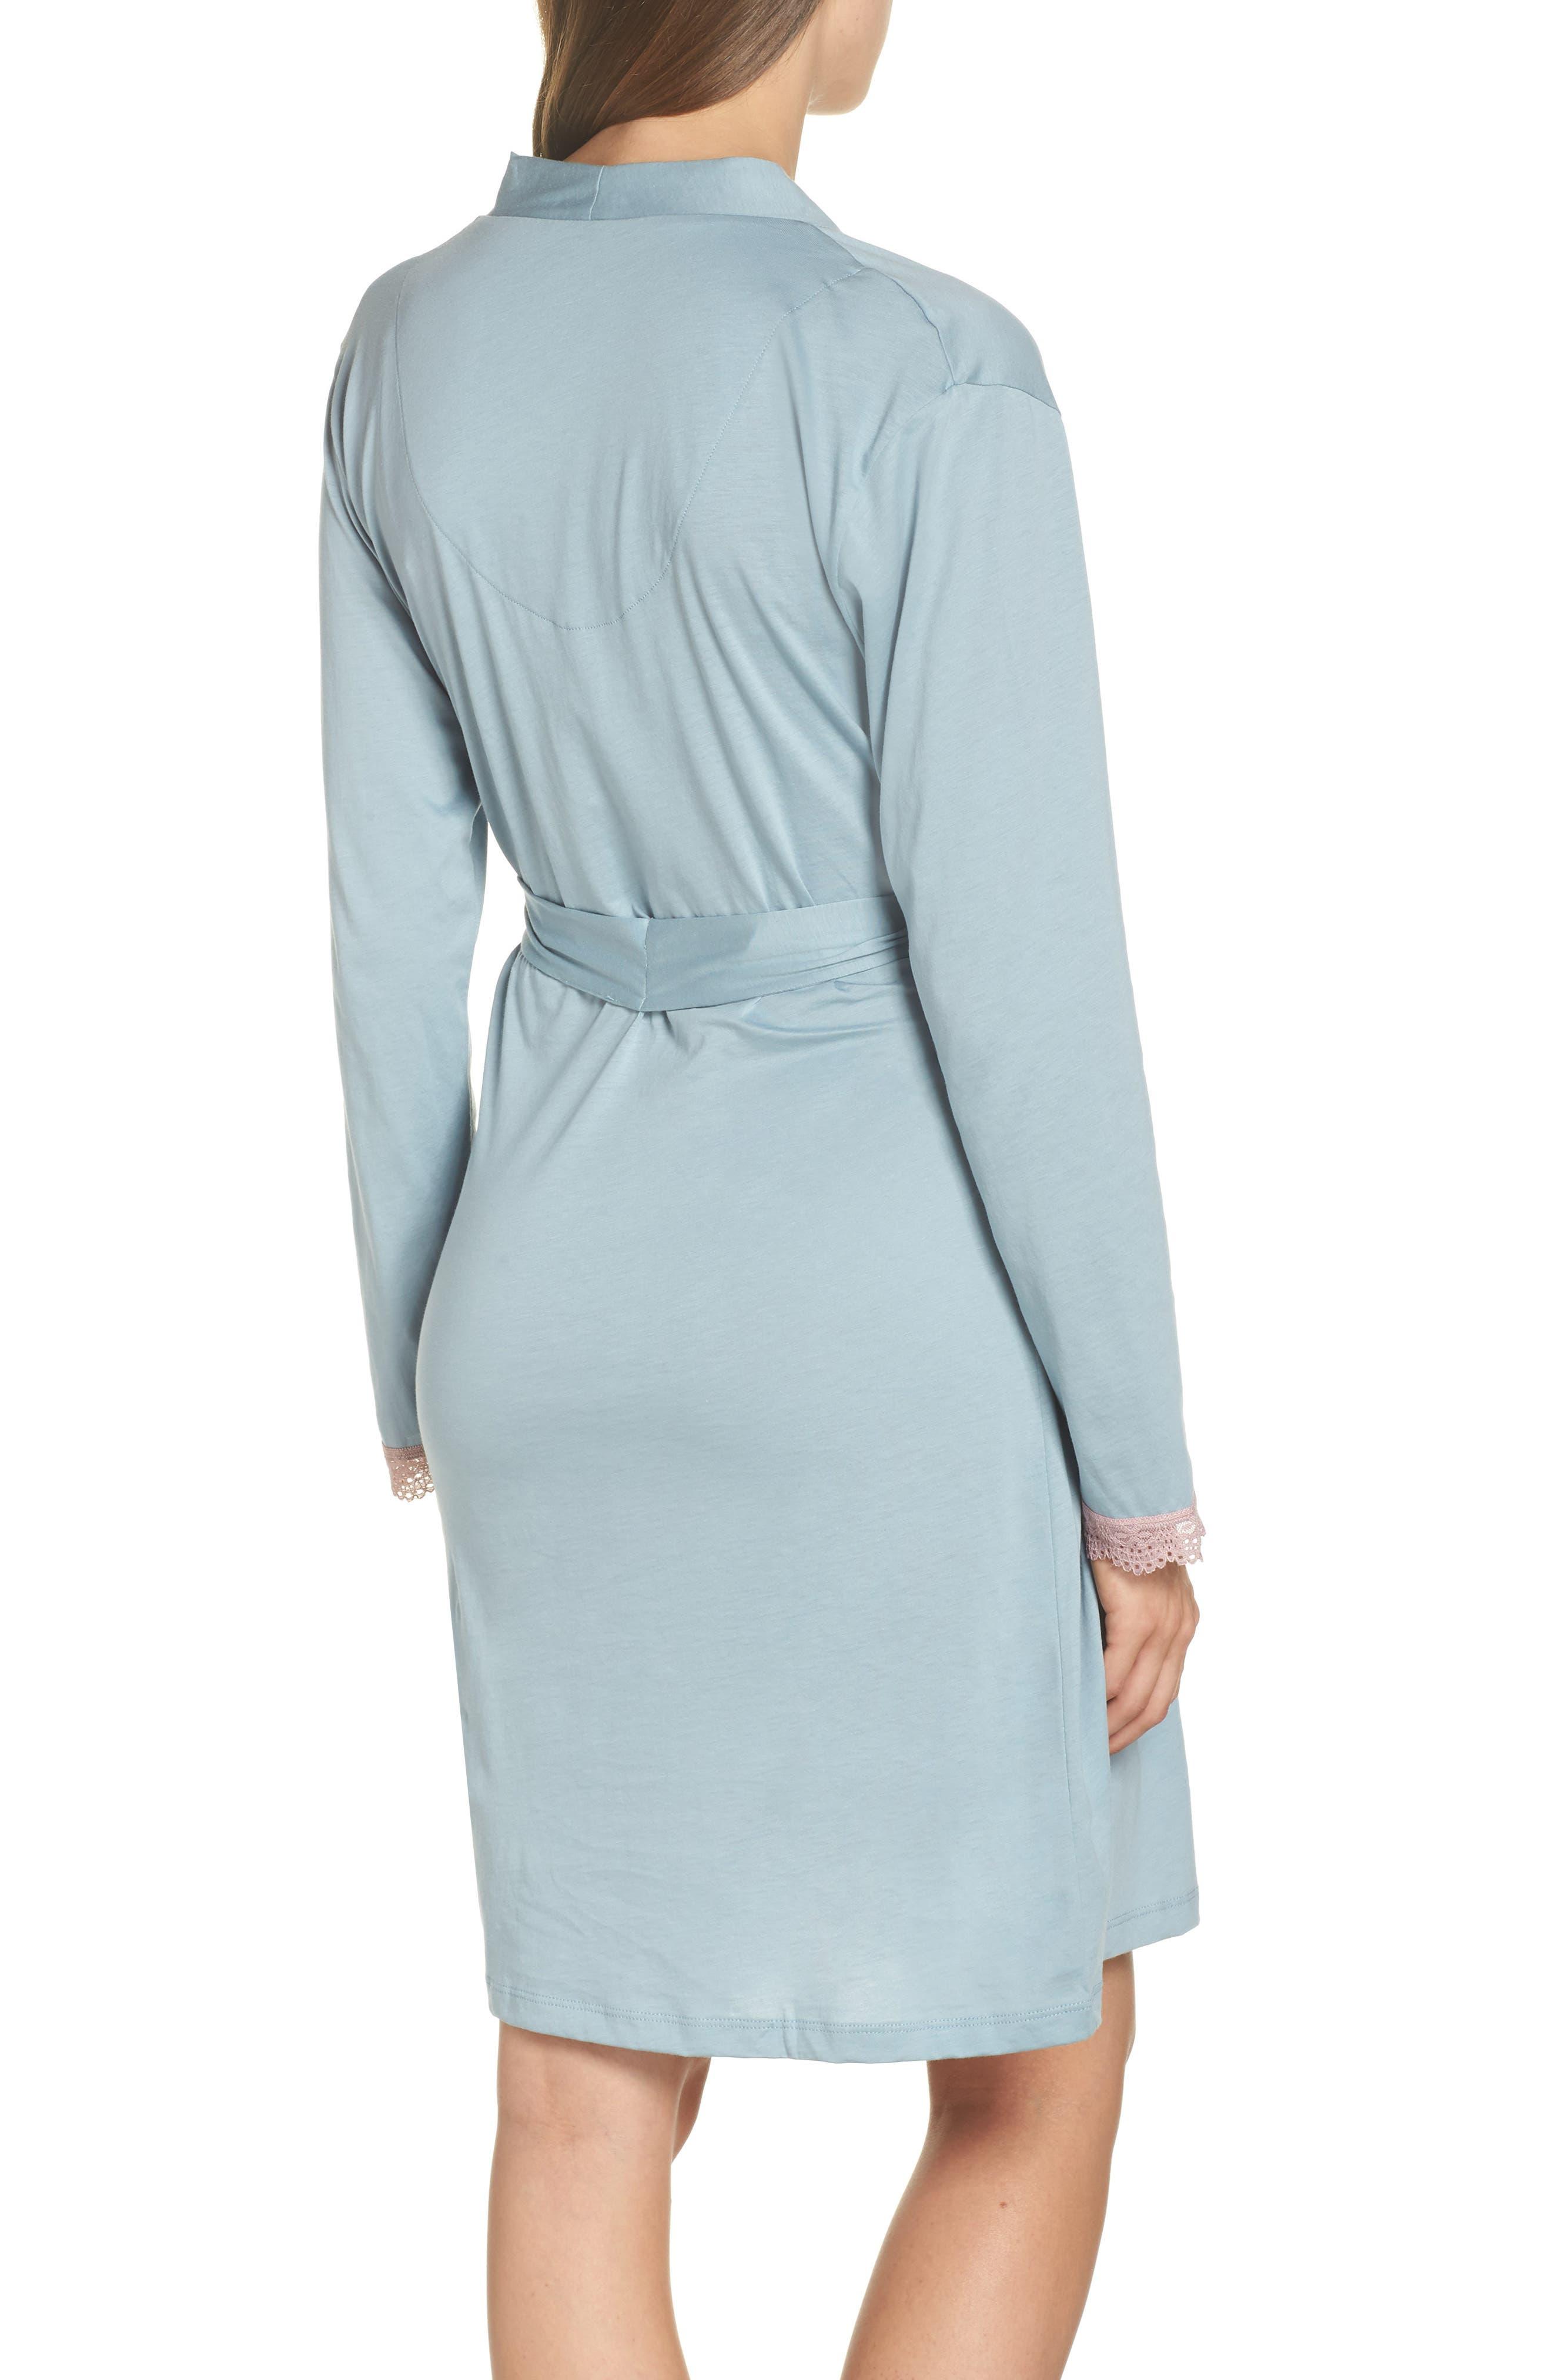 Maternity/Nursing Robe,                             Alternate thumbnail 2, color,                             ROBINS EGG BLUE